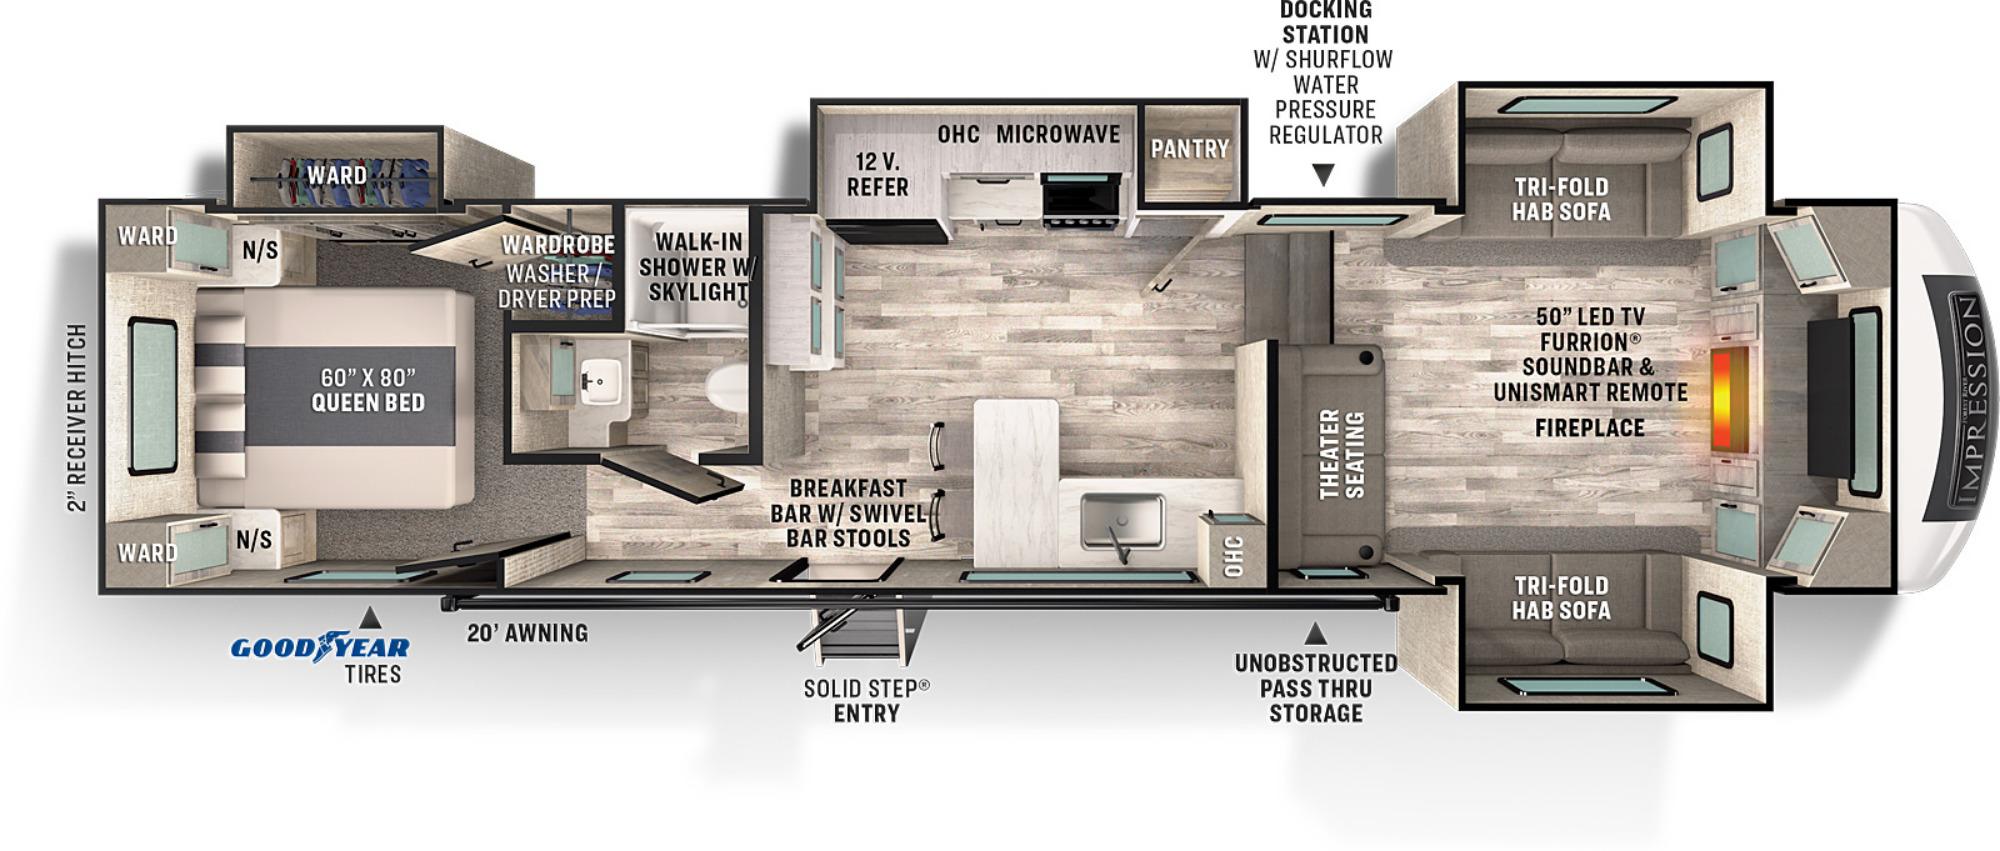 View Floor Plan for 2021 FOREST RIVER IMPRESSION 320FL